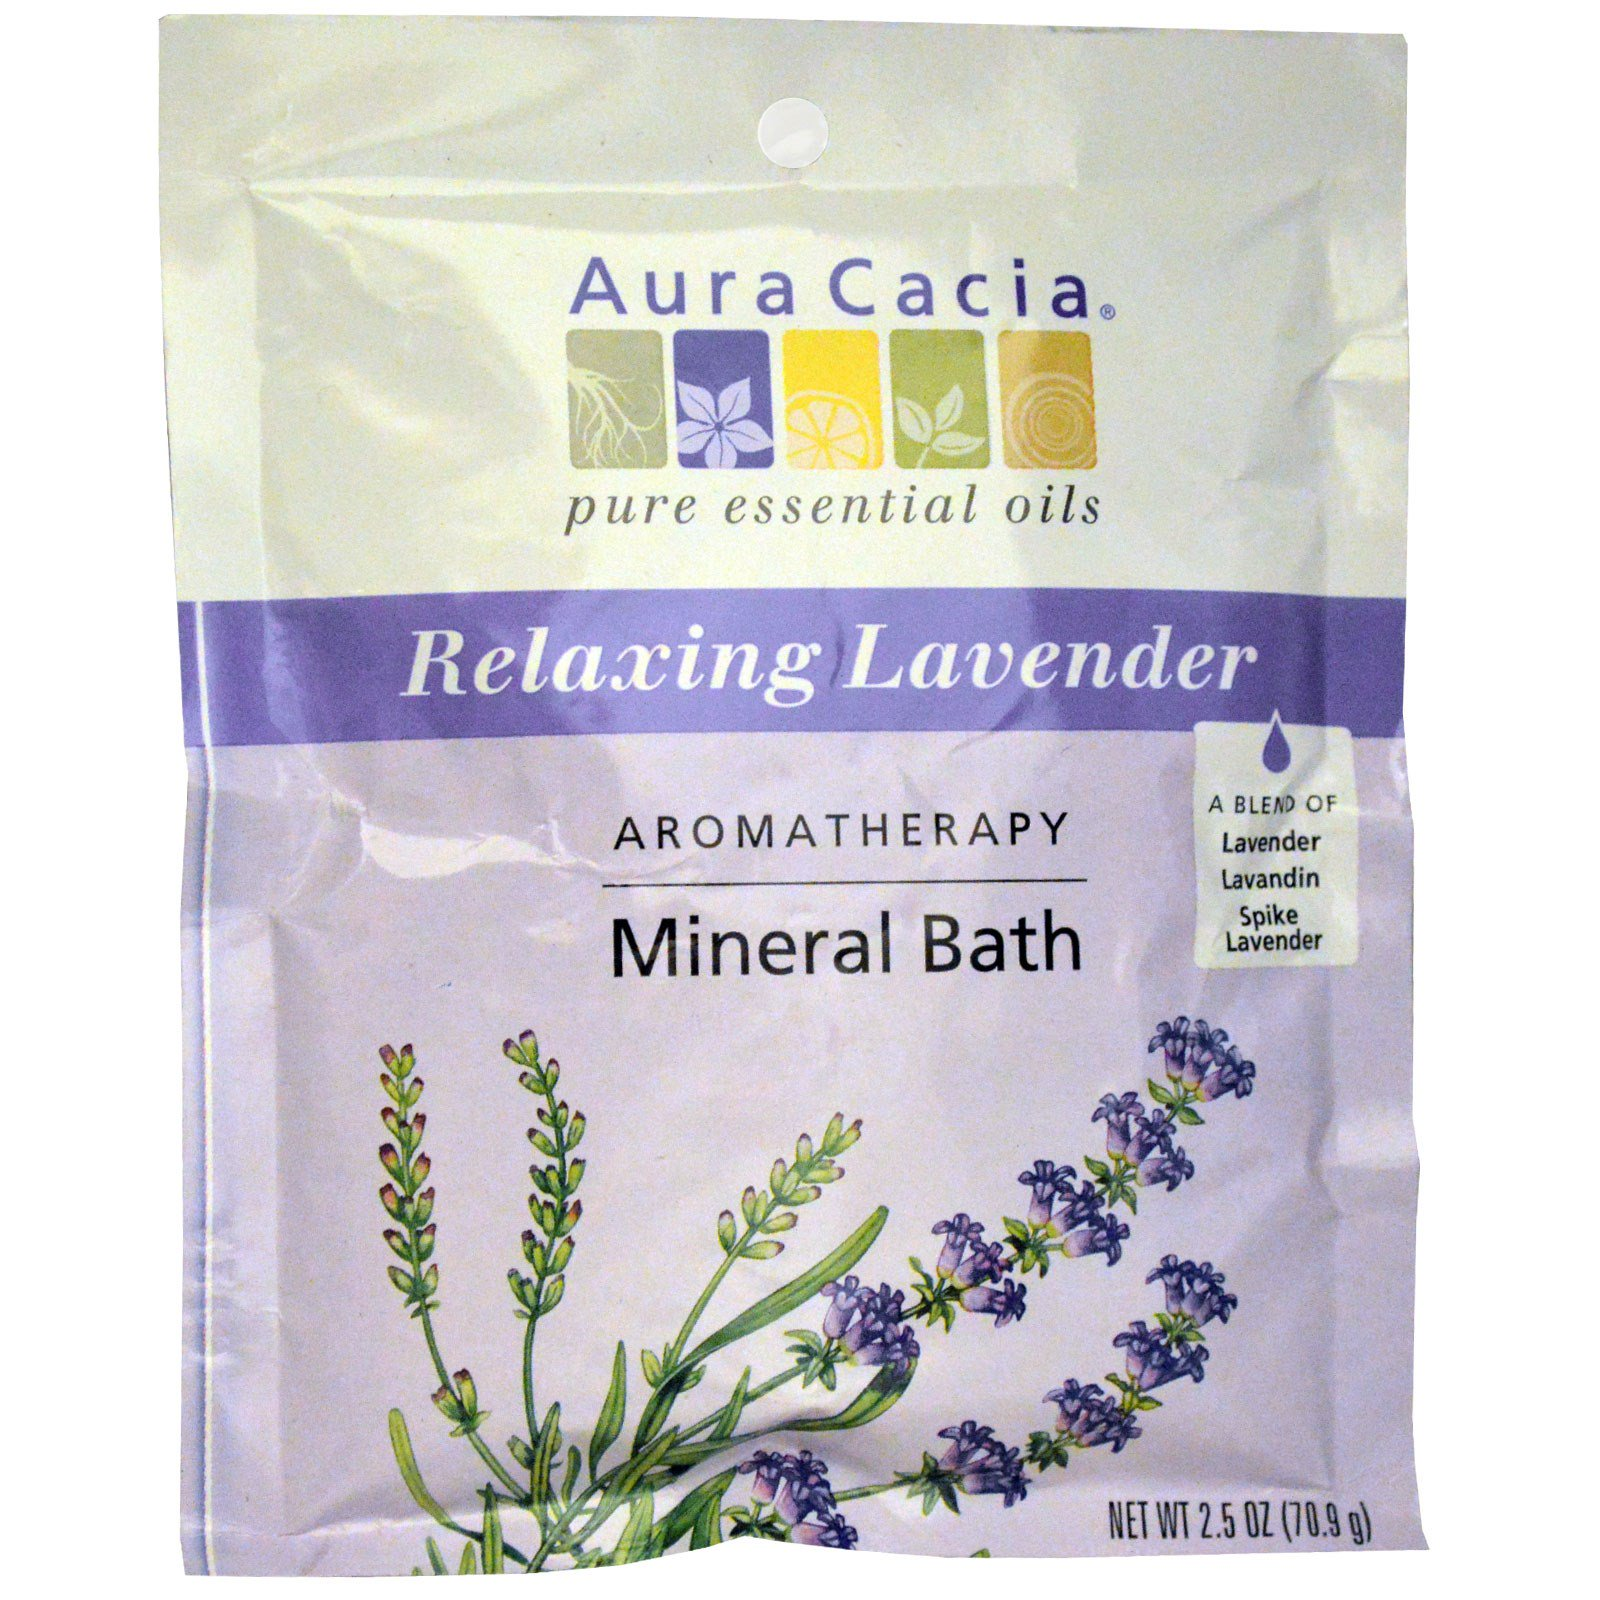 Aura Cacia, Aromatherapy Mineral Bath, расслабляющая лаванда, 70,9 г (2,5 унций)